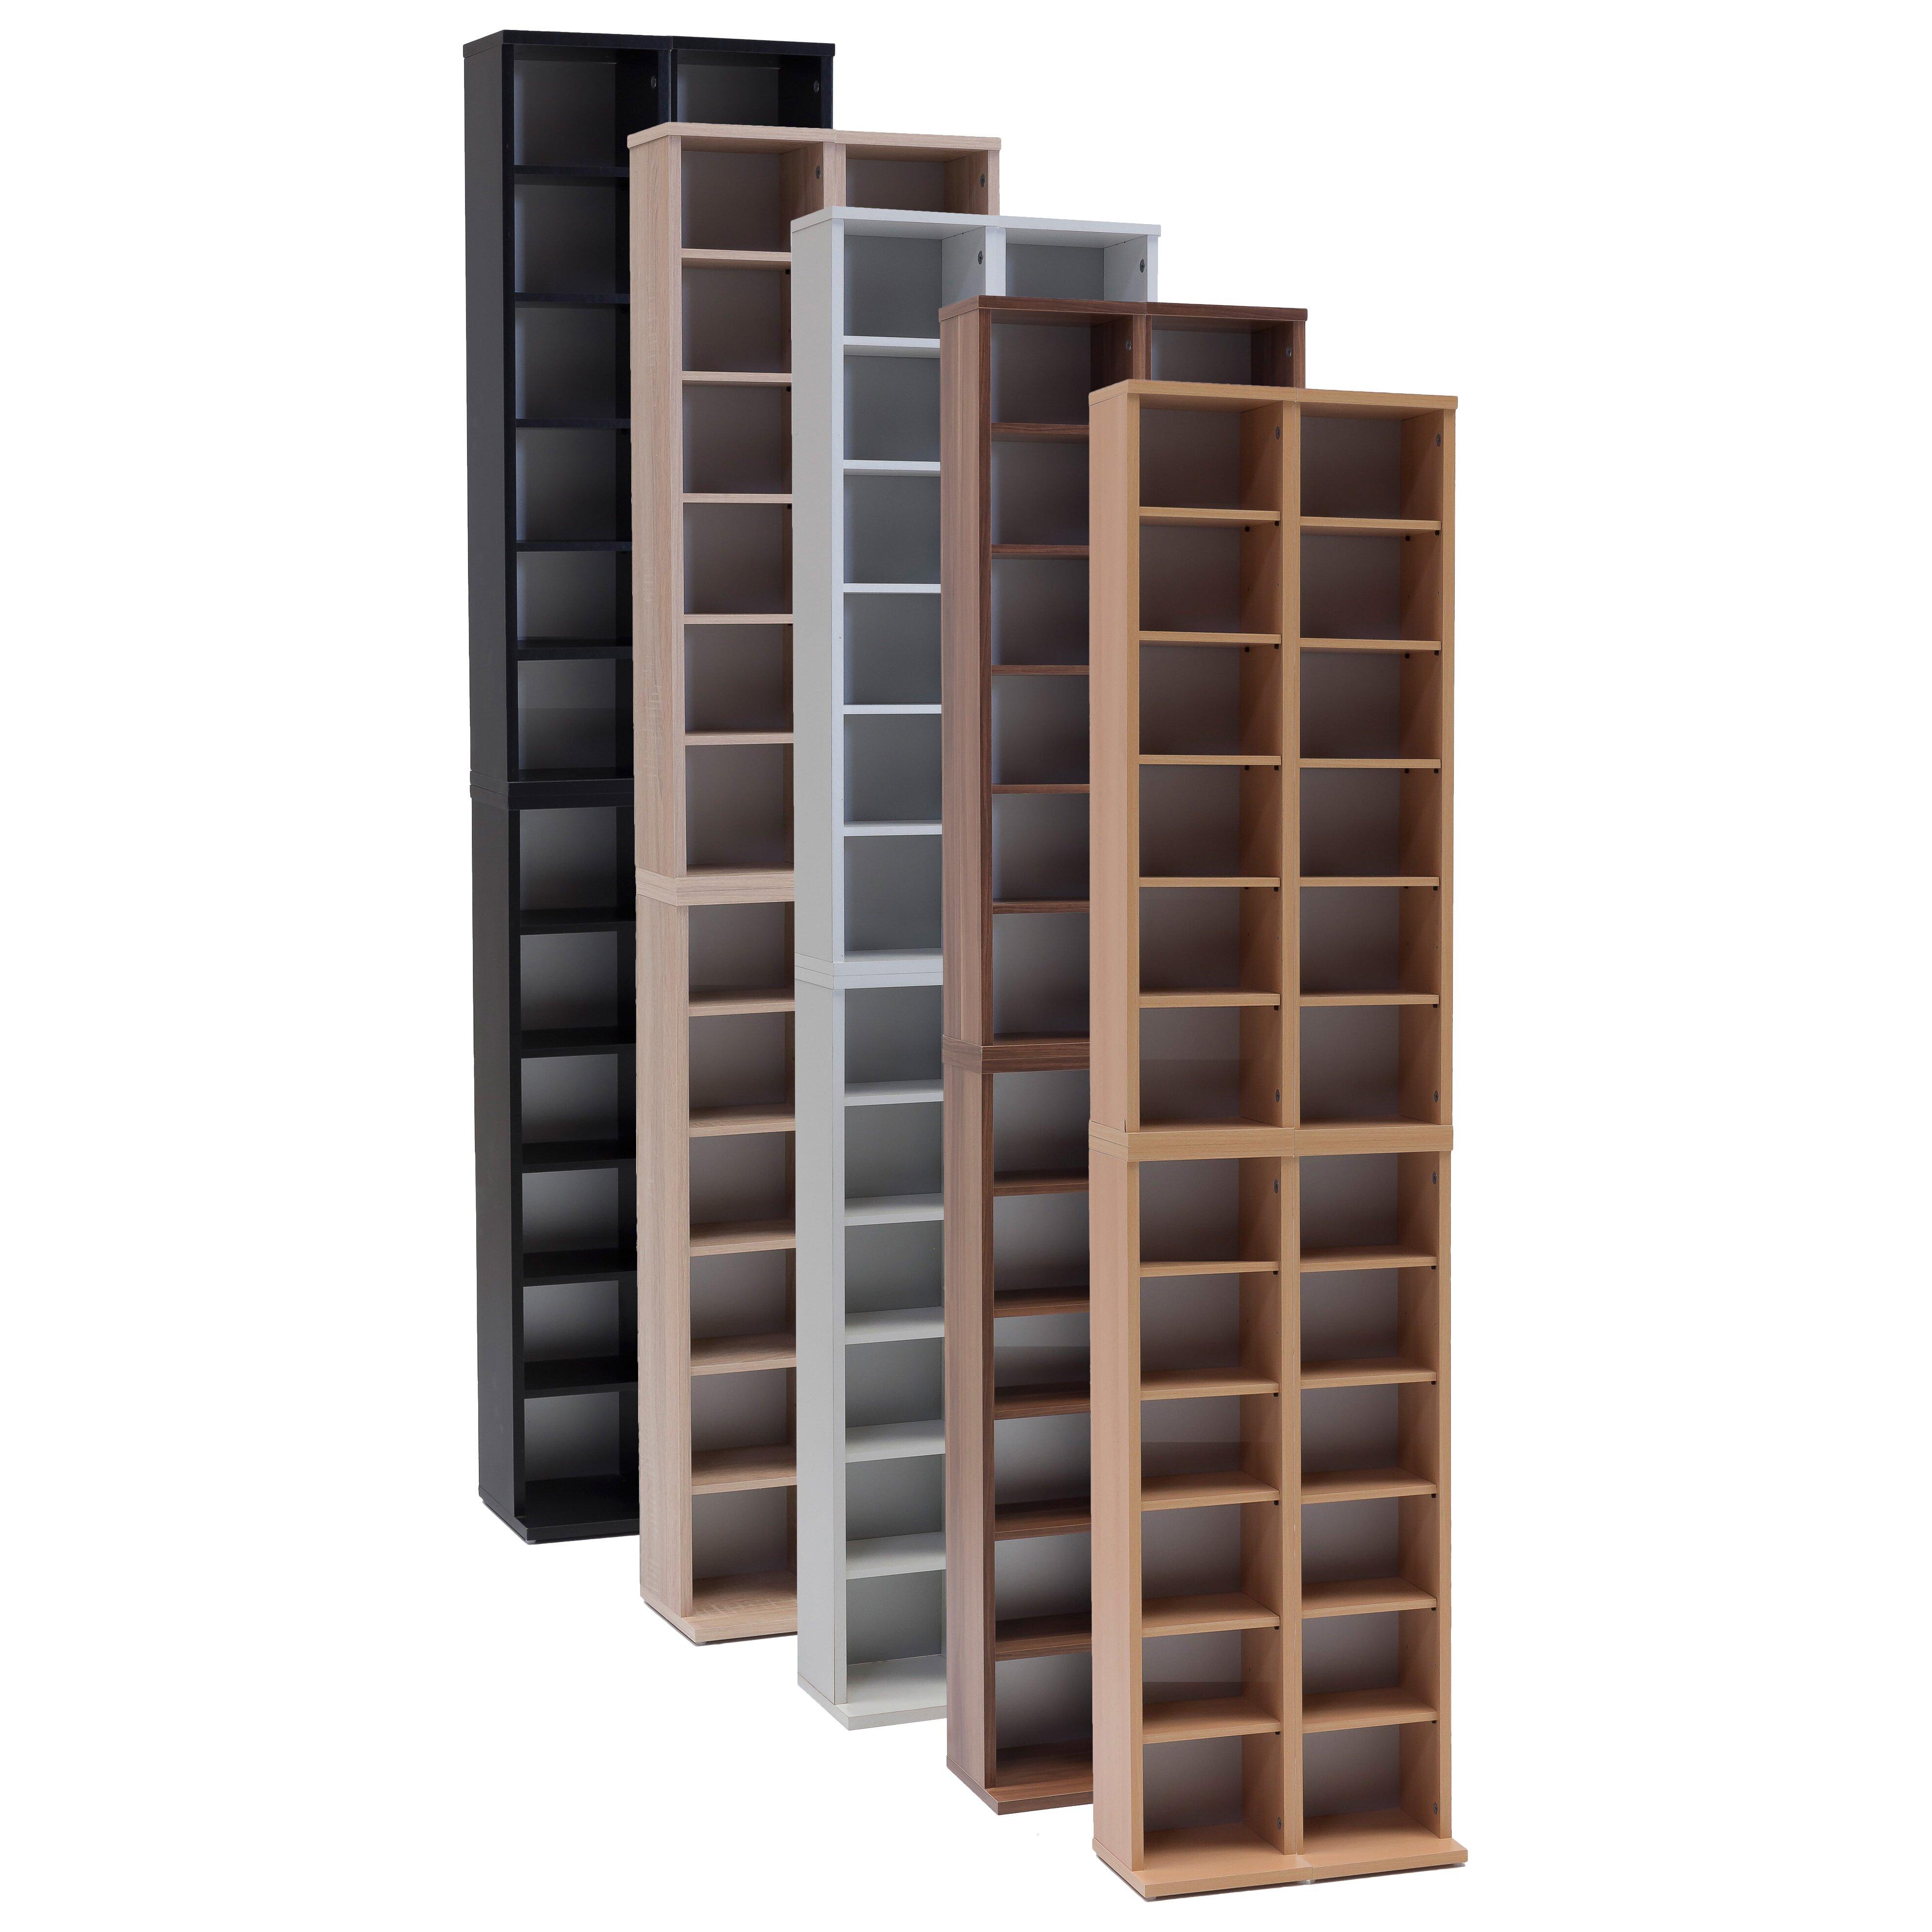 vcm multimedia regal almera reviews von vcm. Black Bedroom Furniture Sets. Home Design Ideas